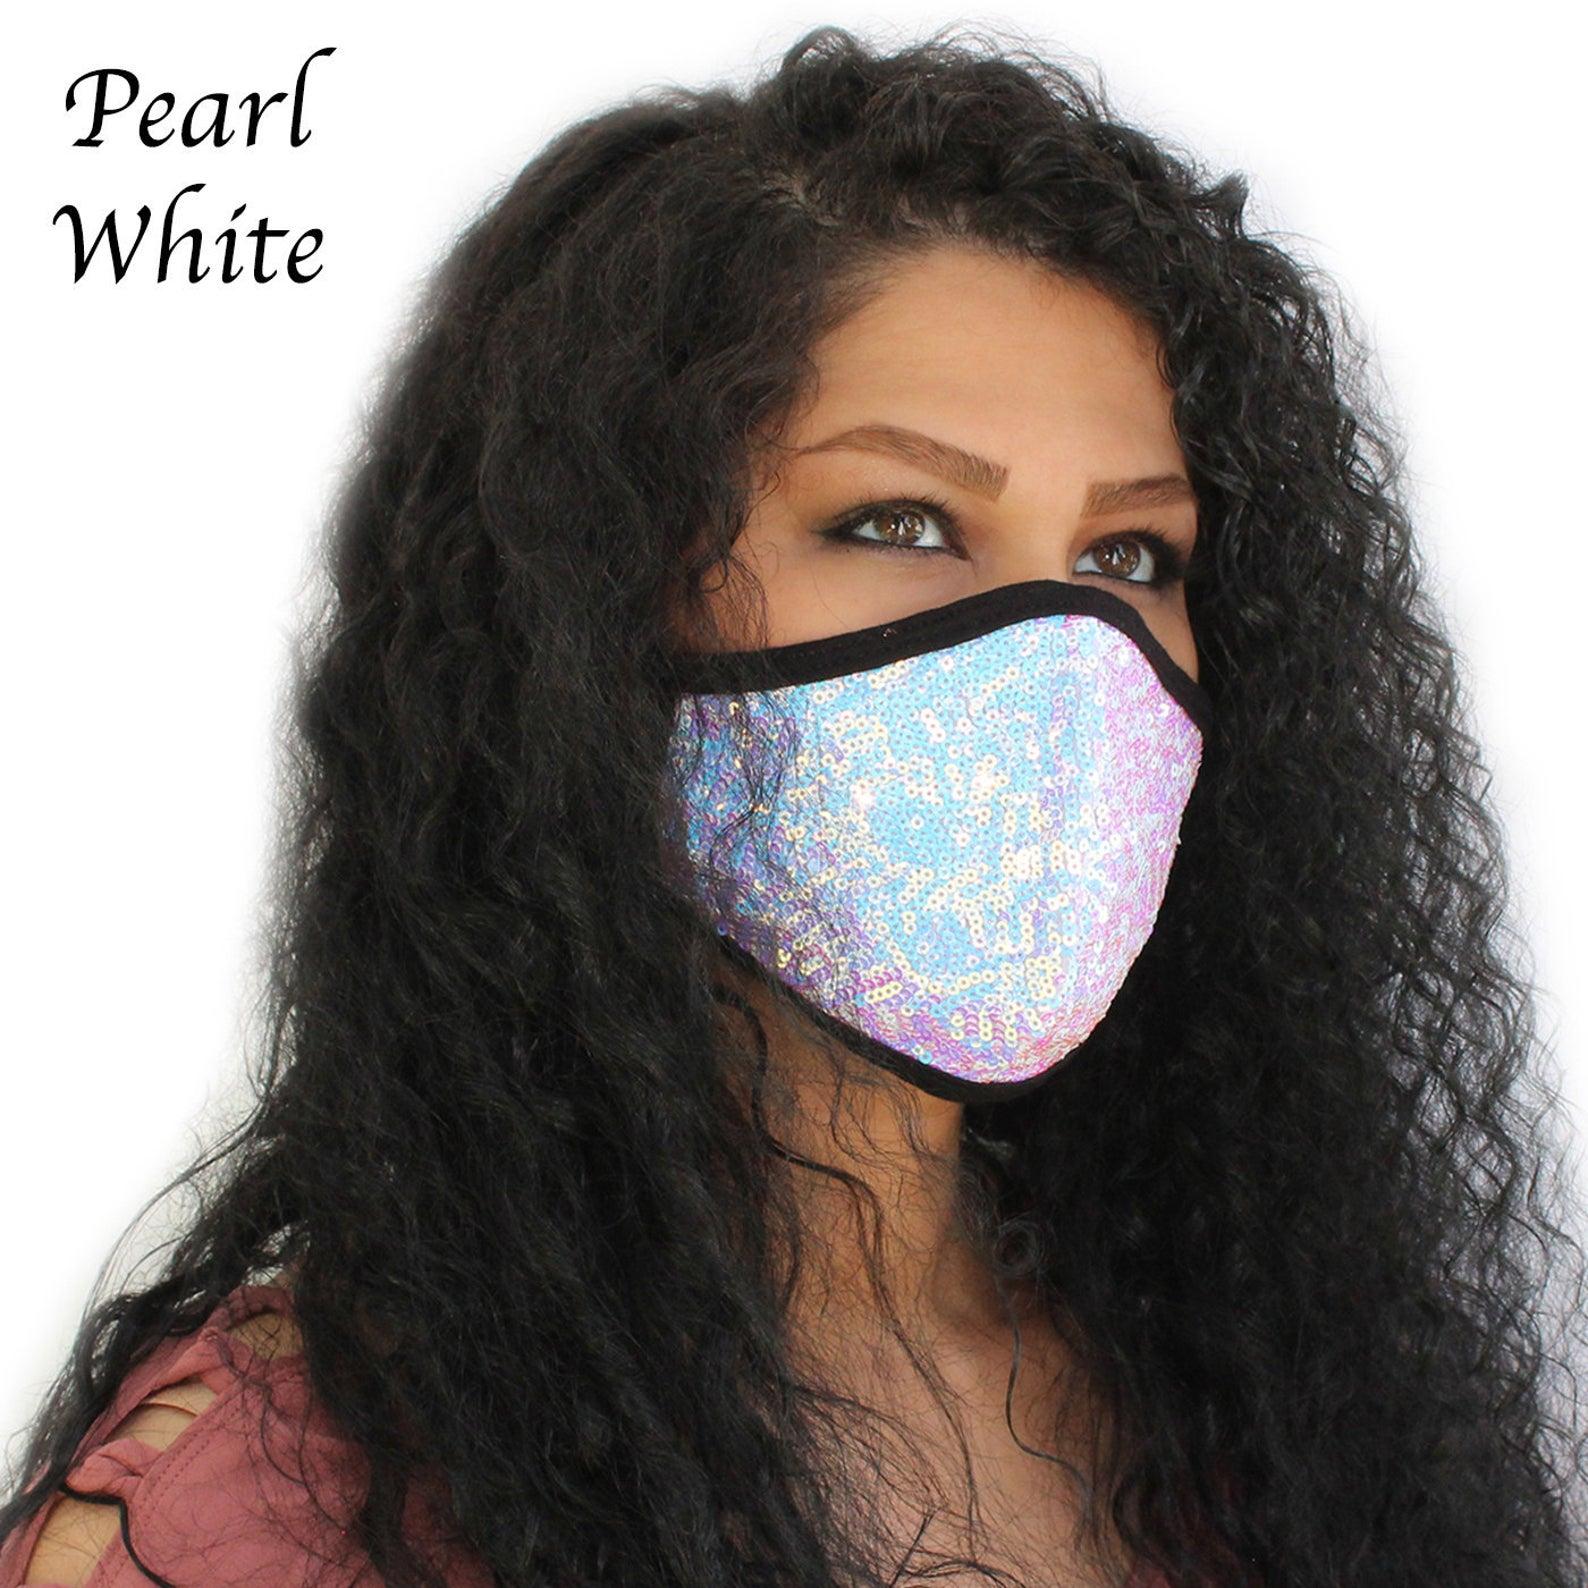 ariana grande sparkly face mask etsy